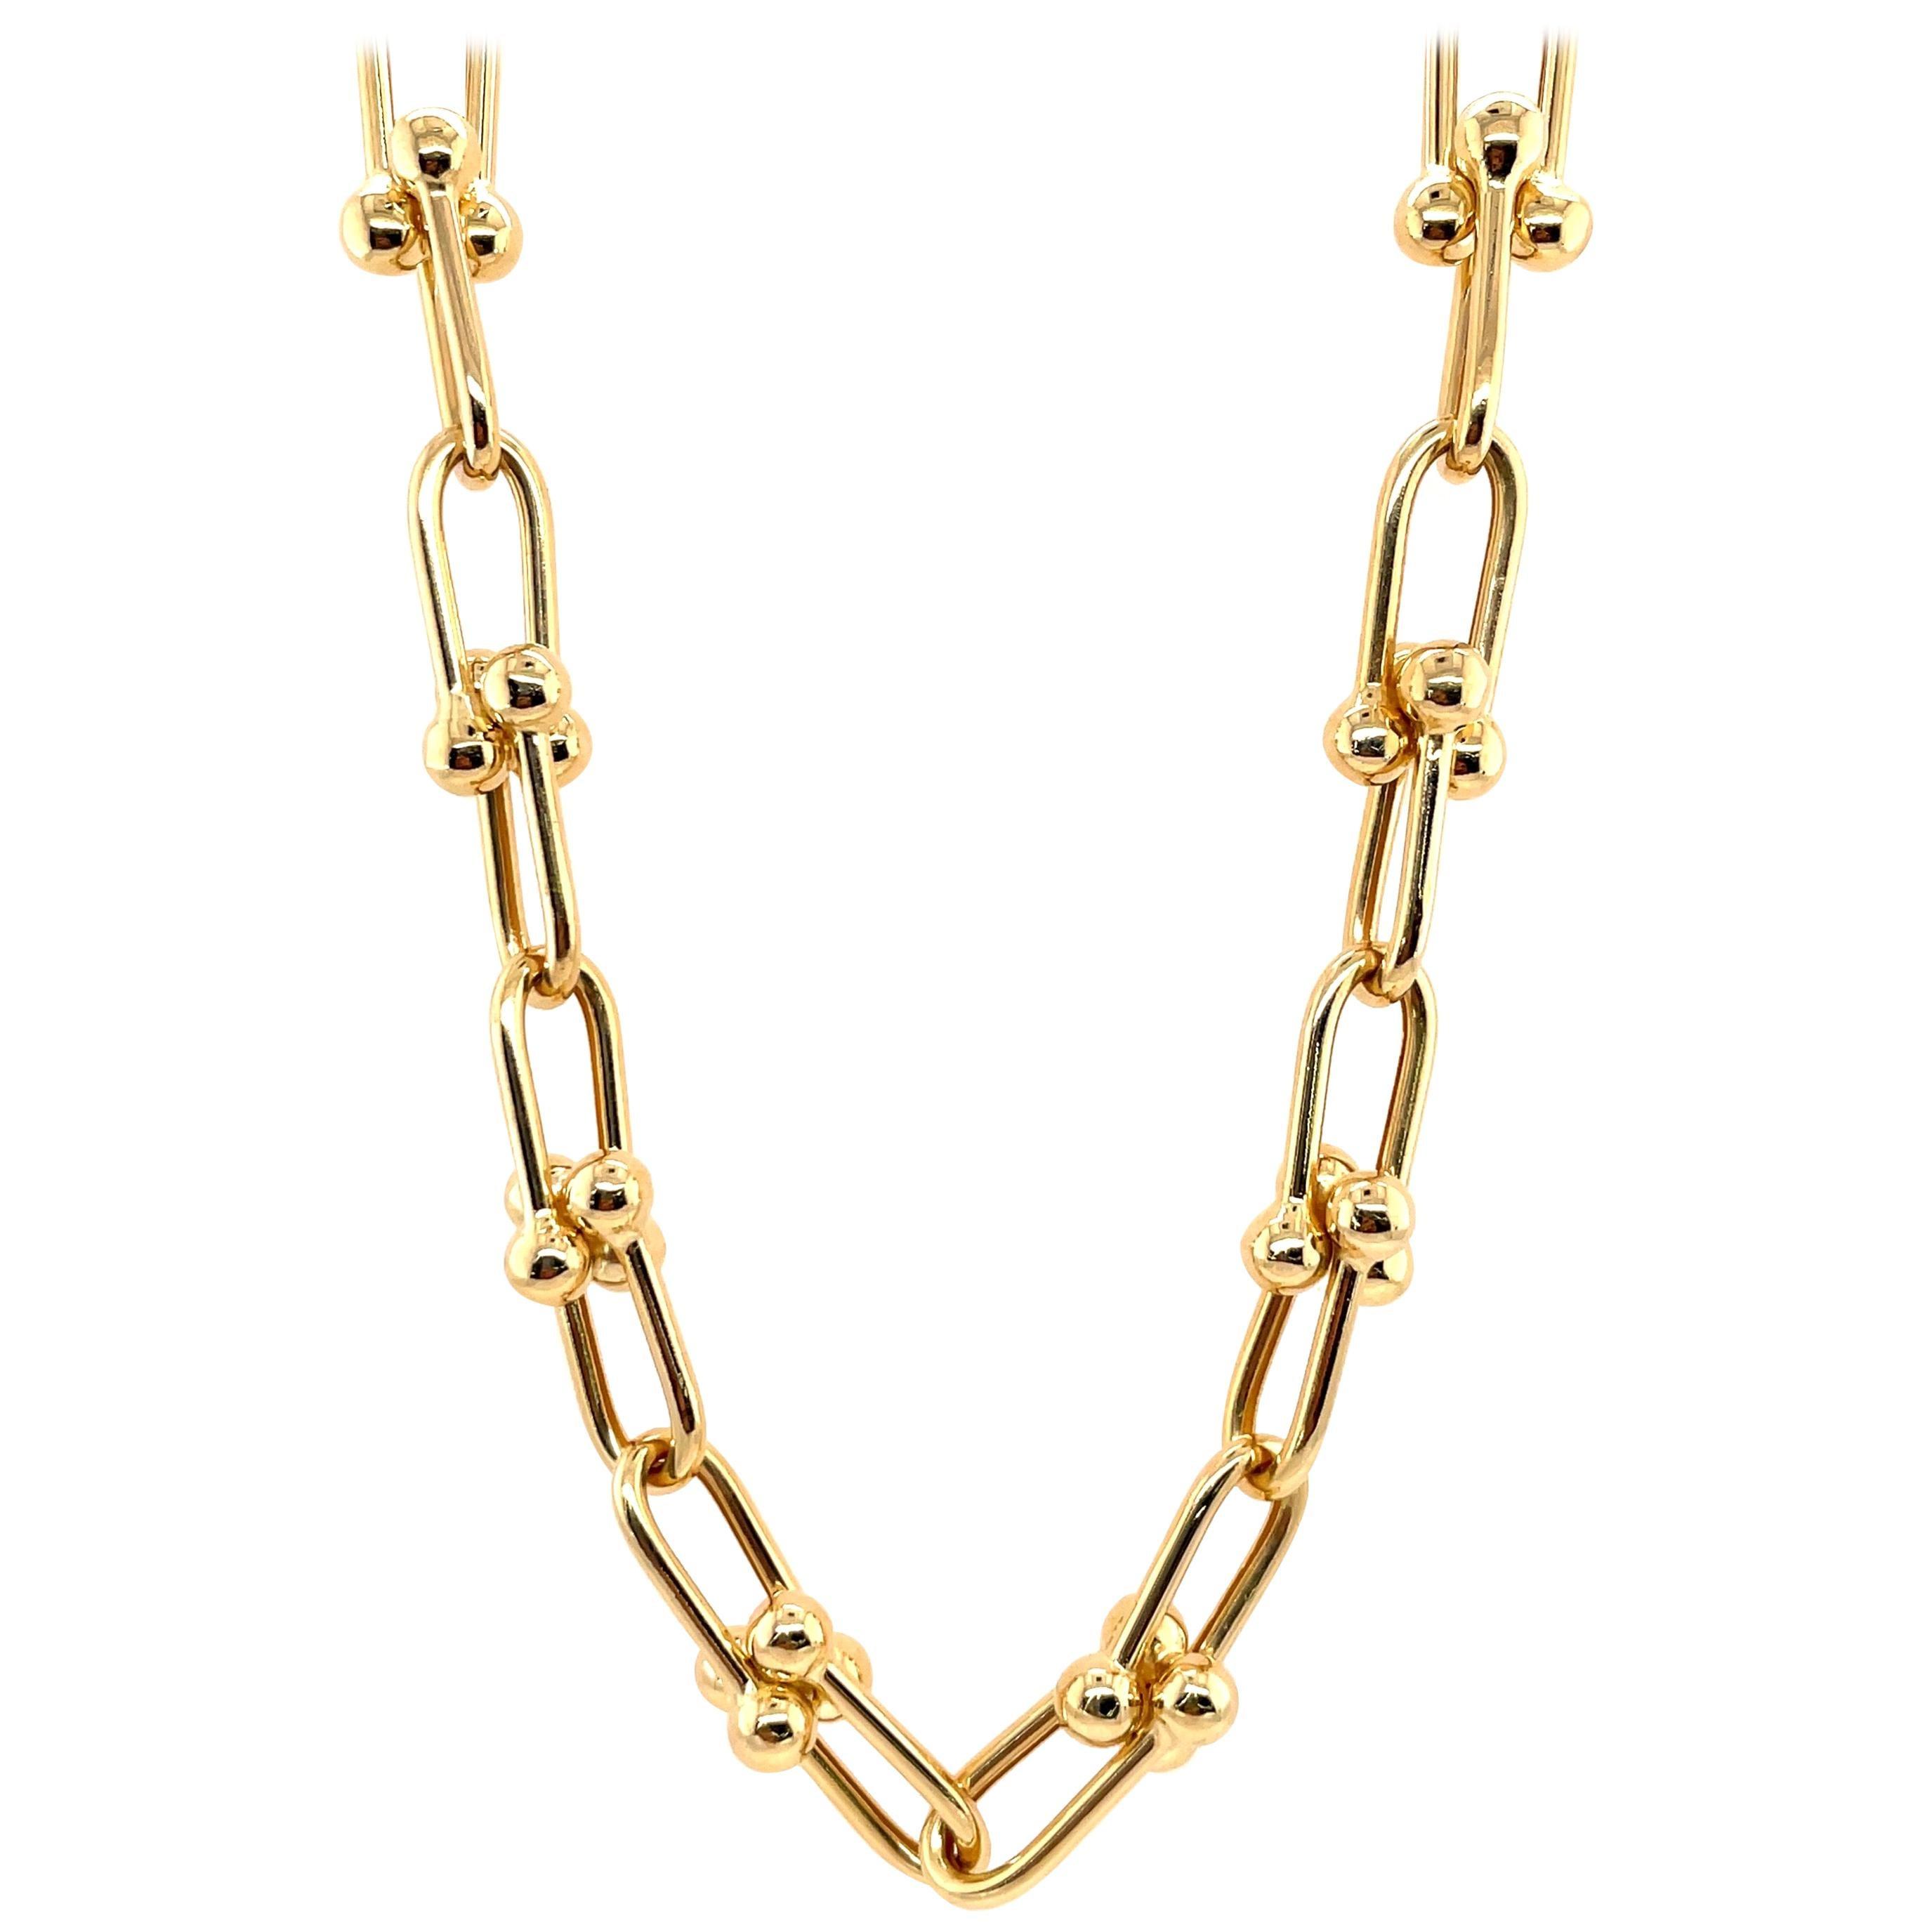 Italian 14 Karat Yellow Gold Link Ball Collar Necklace